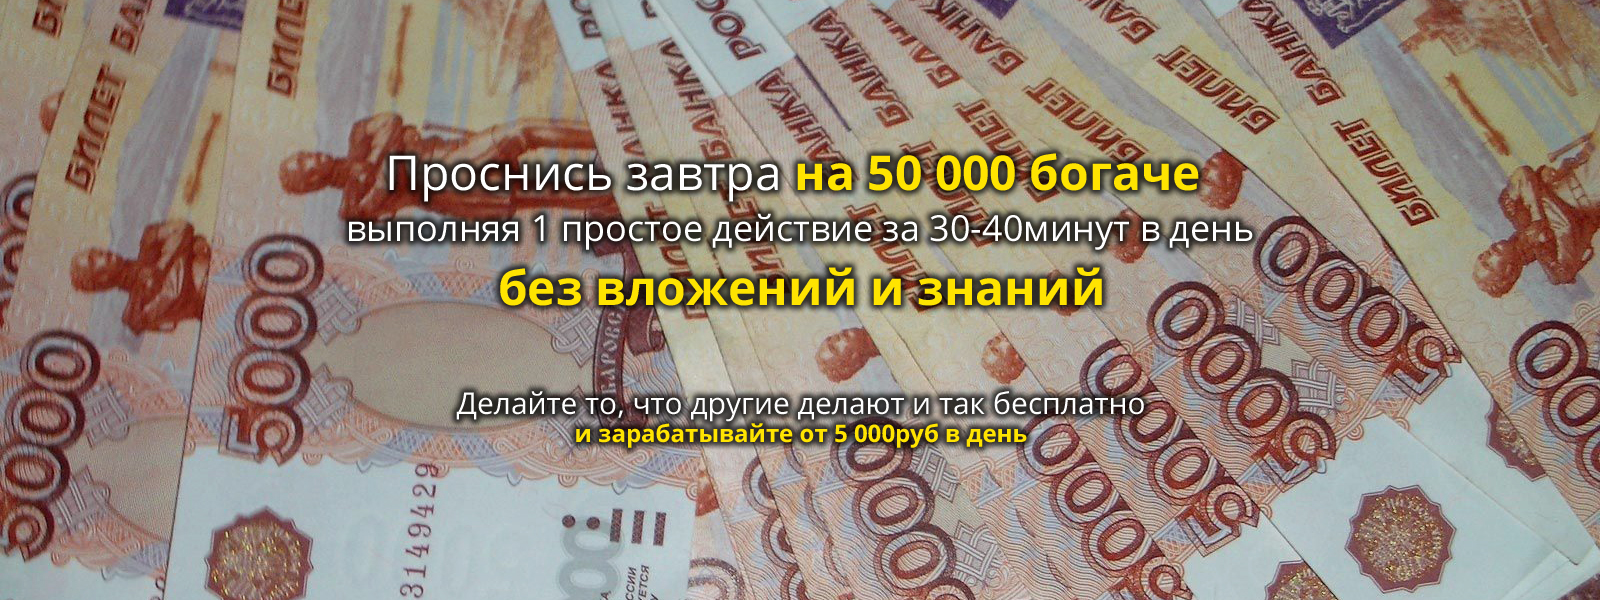 http://media.lpgenerator.ru/images/160640/1ekran_BBnyyhm.jpg#size_1600x600